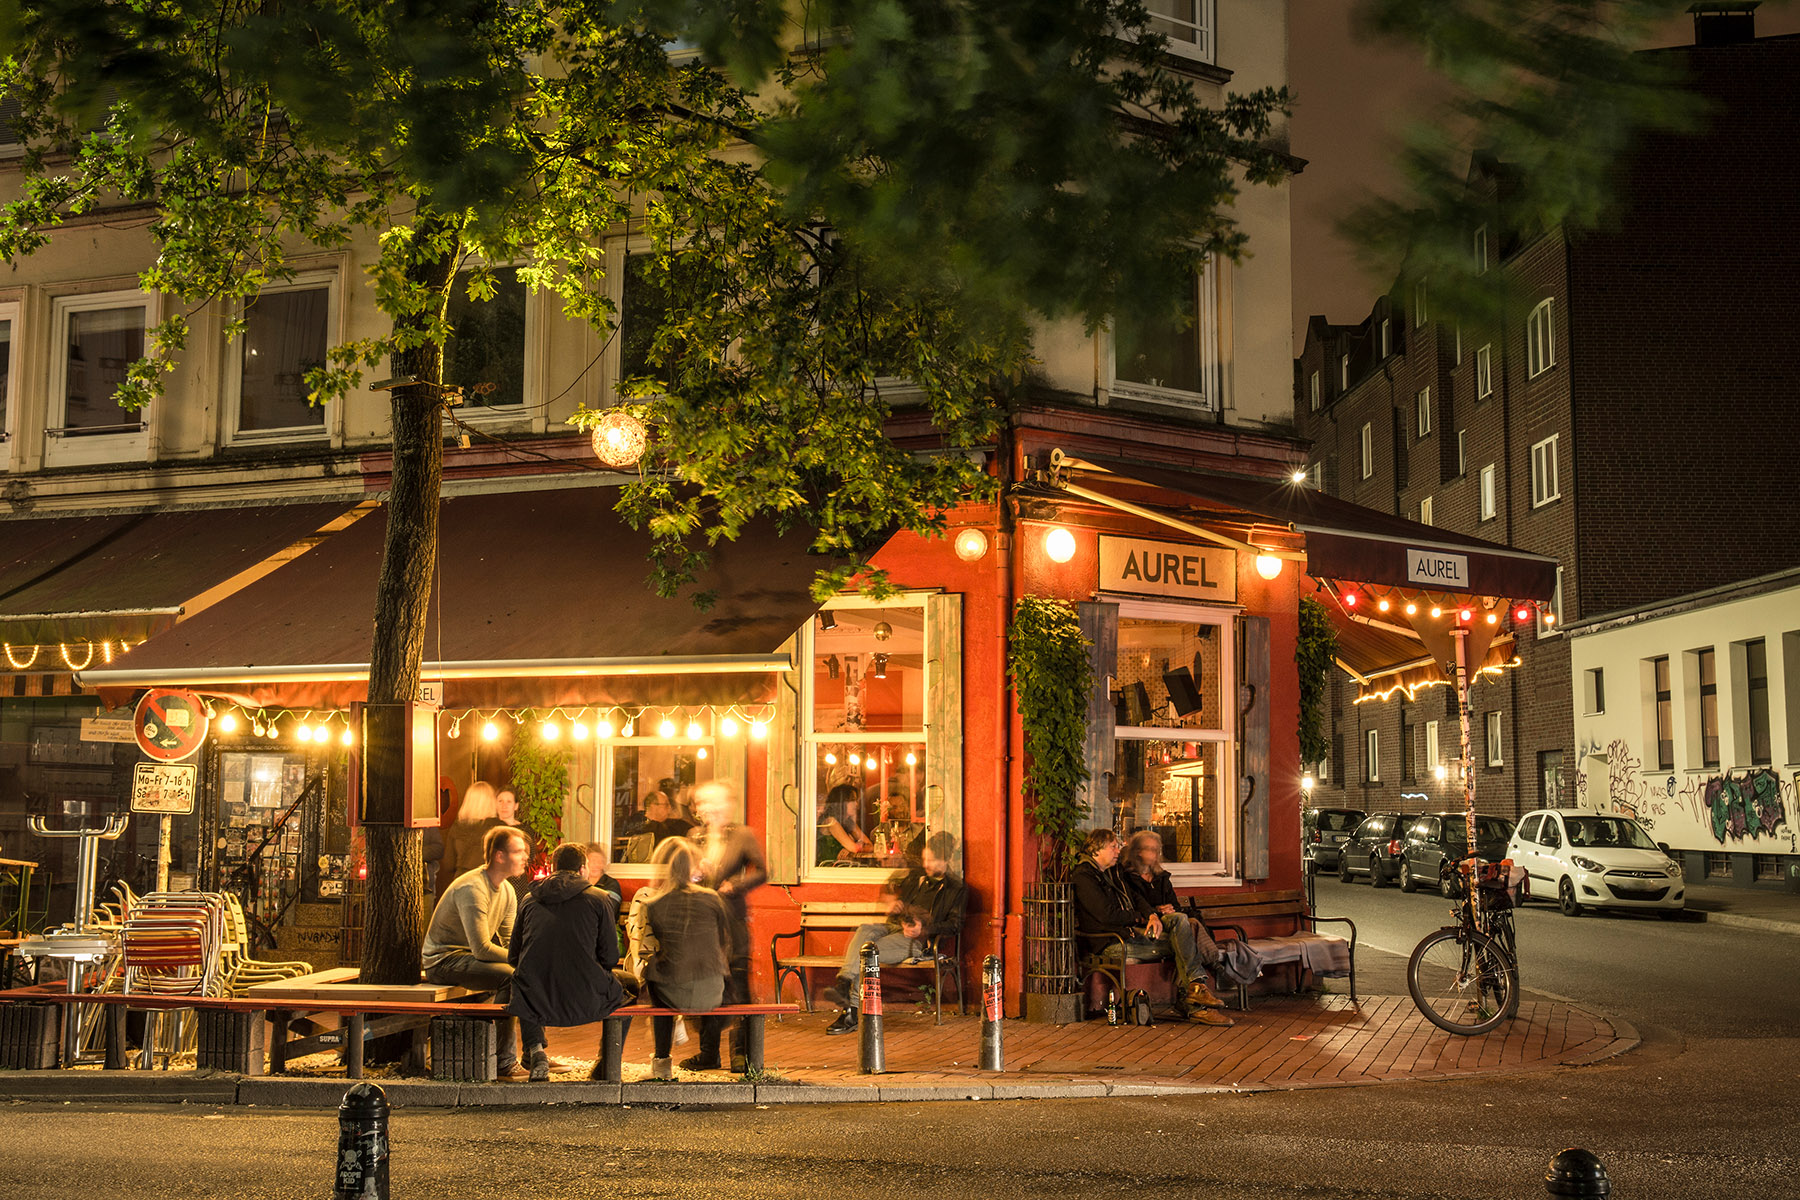 Bars in the Altona borough of Hamburg